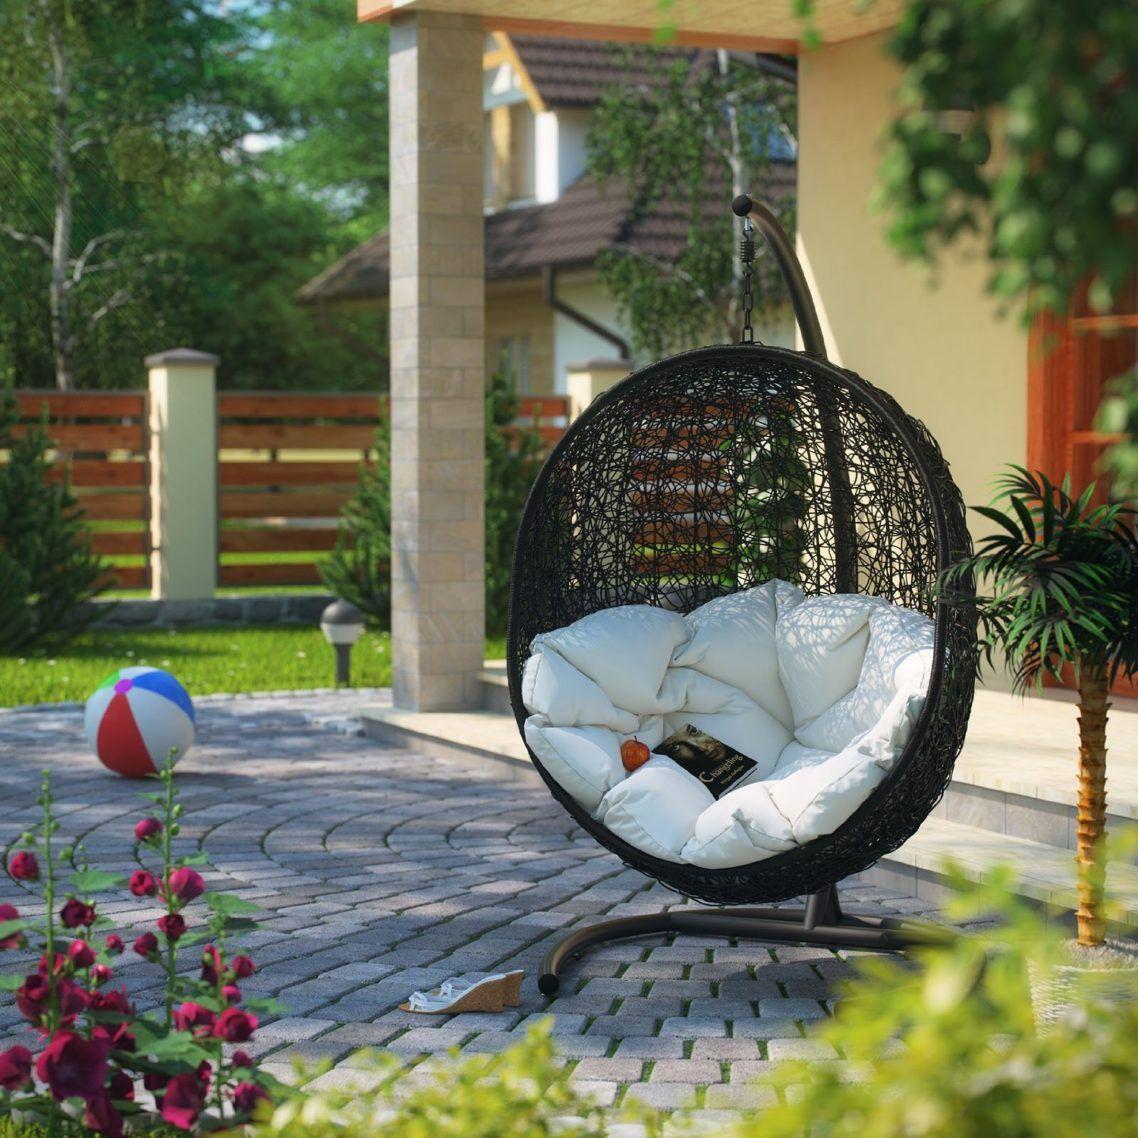 luxury outdoor furniture pool egg shape metal patio chairs swing